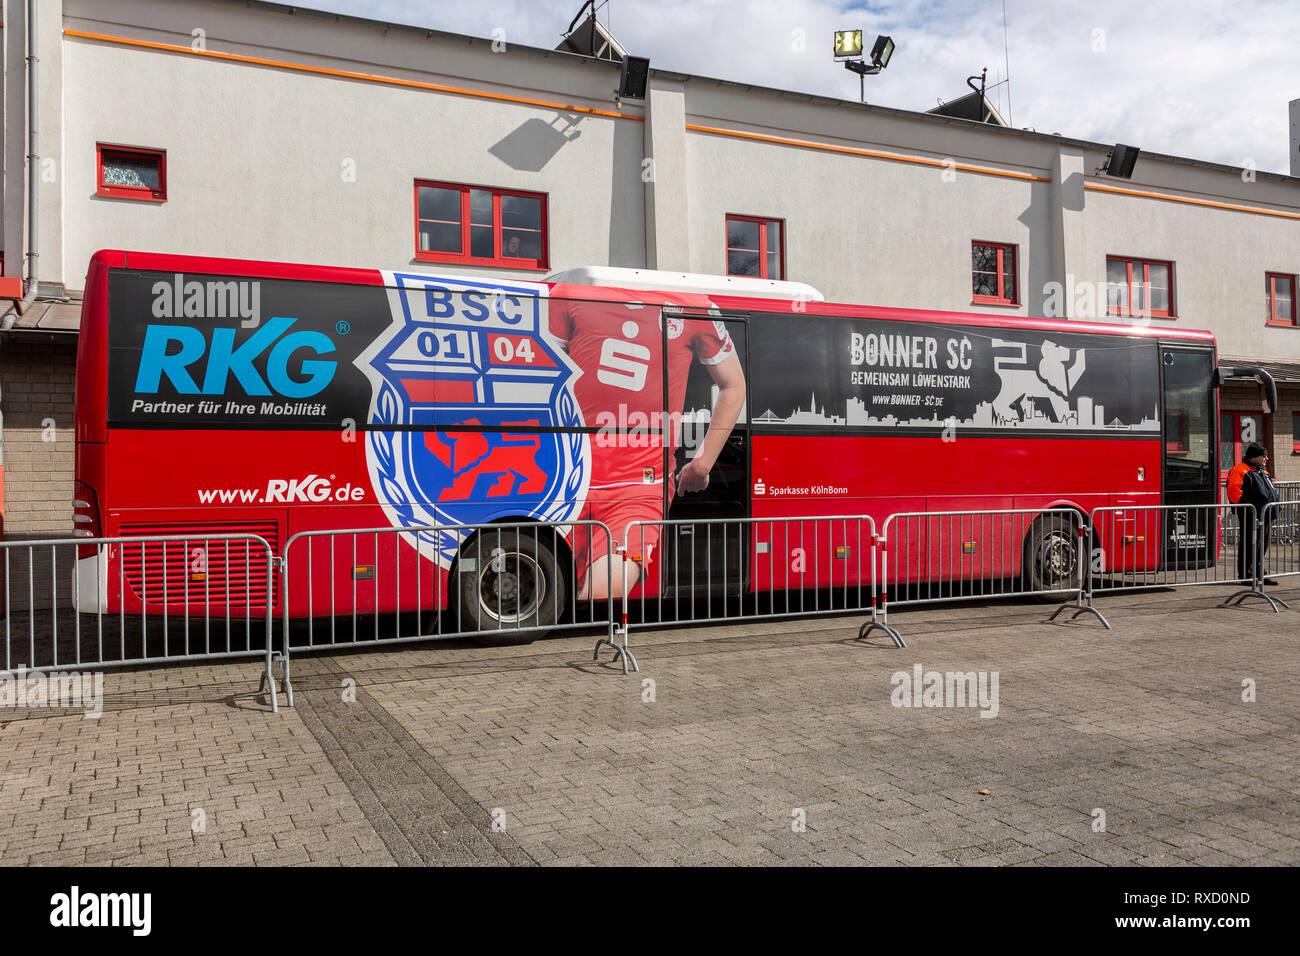 sports, football, Regional League West, 2018/2019, Rot Weiss Oberhausen vs Bonner SC 01/04 4-0, Stadium Niederrhein in Oberhausen, team bus of Bonn - Stock Image